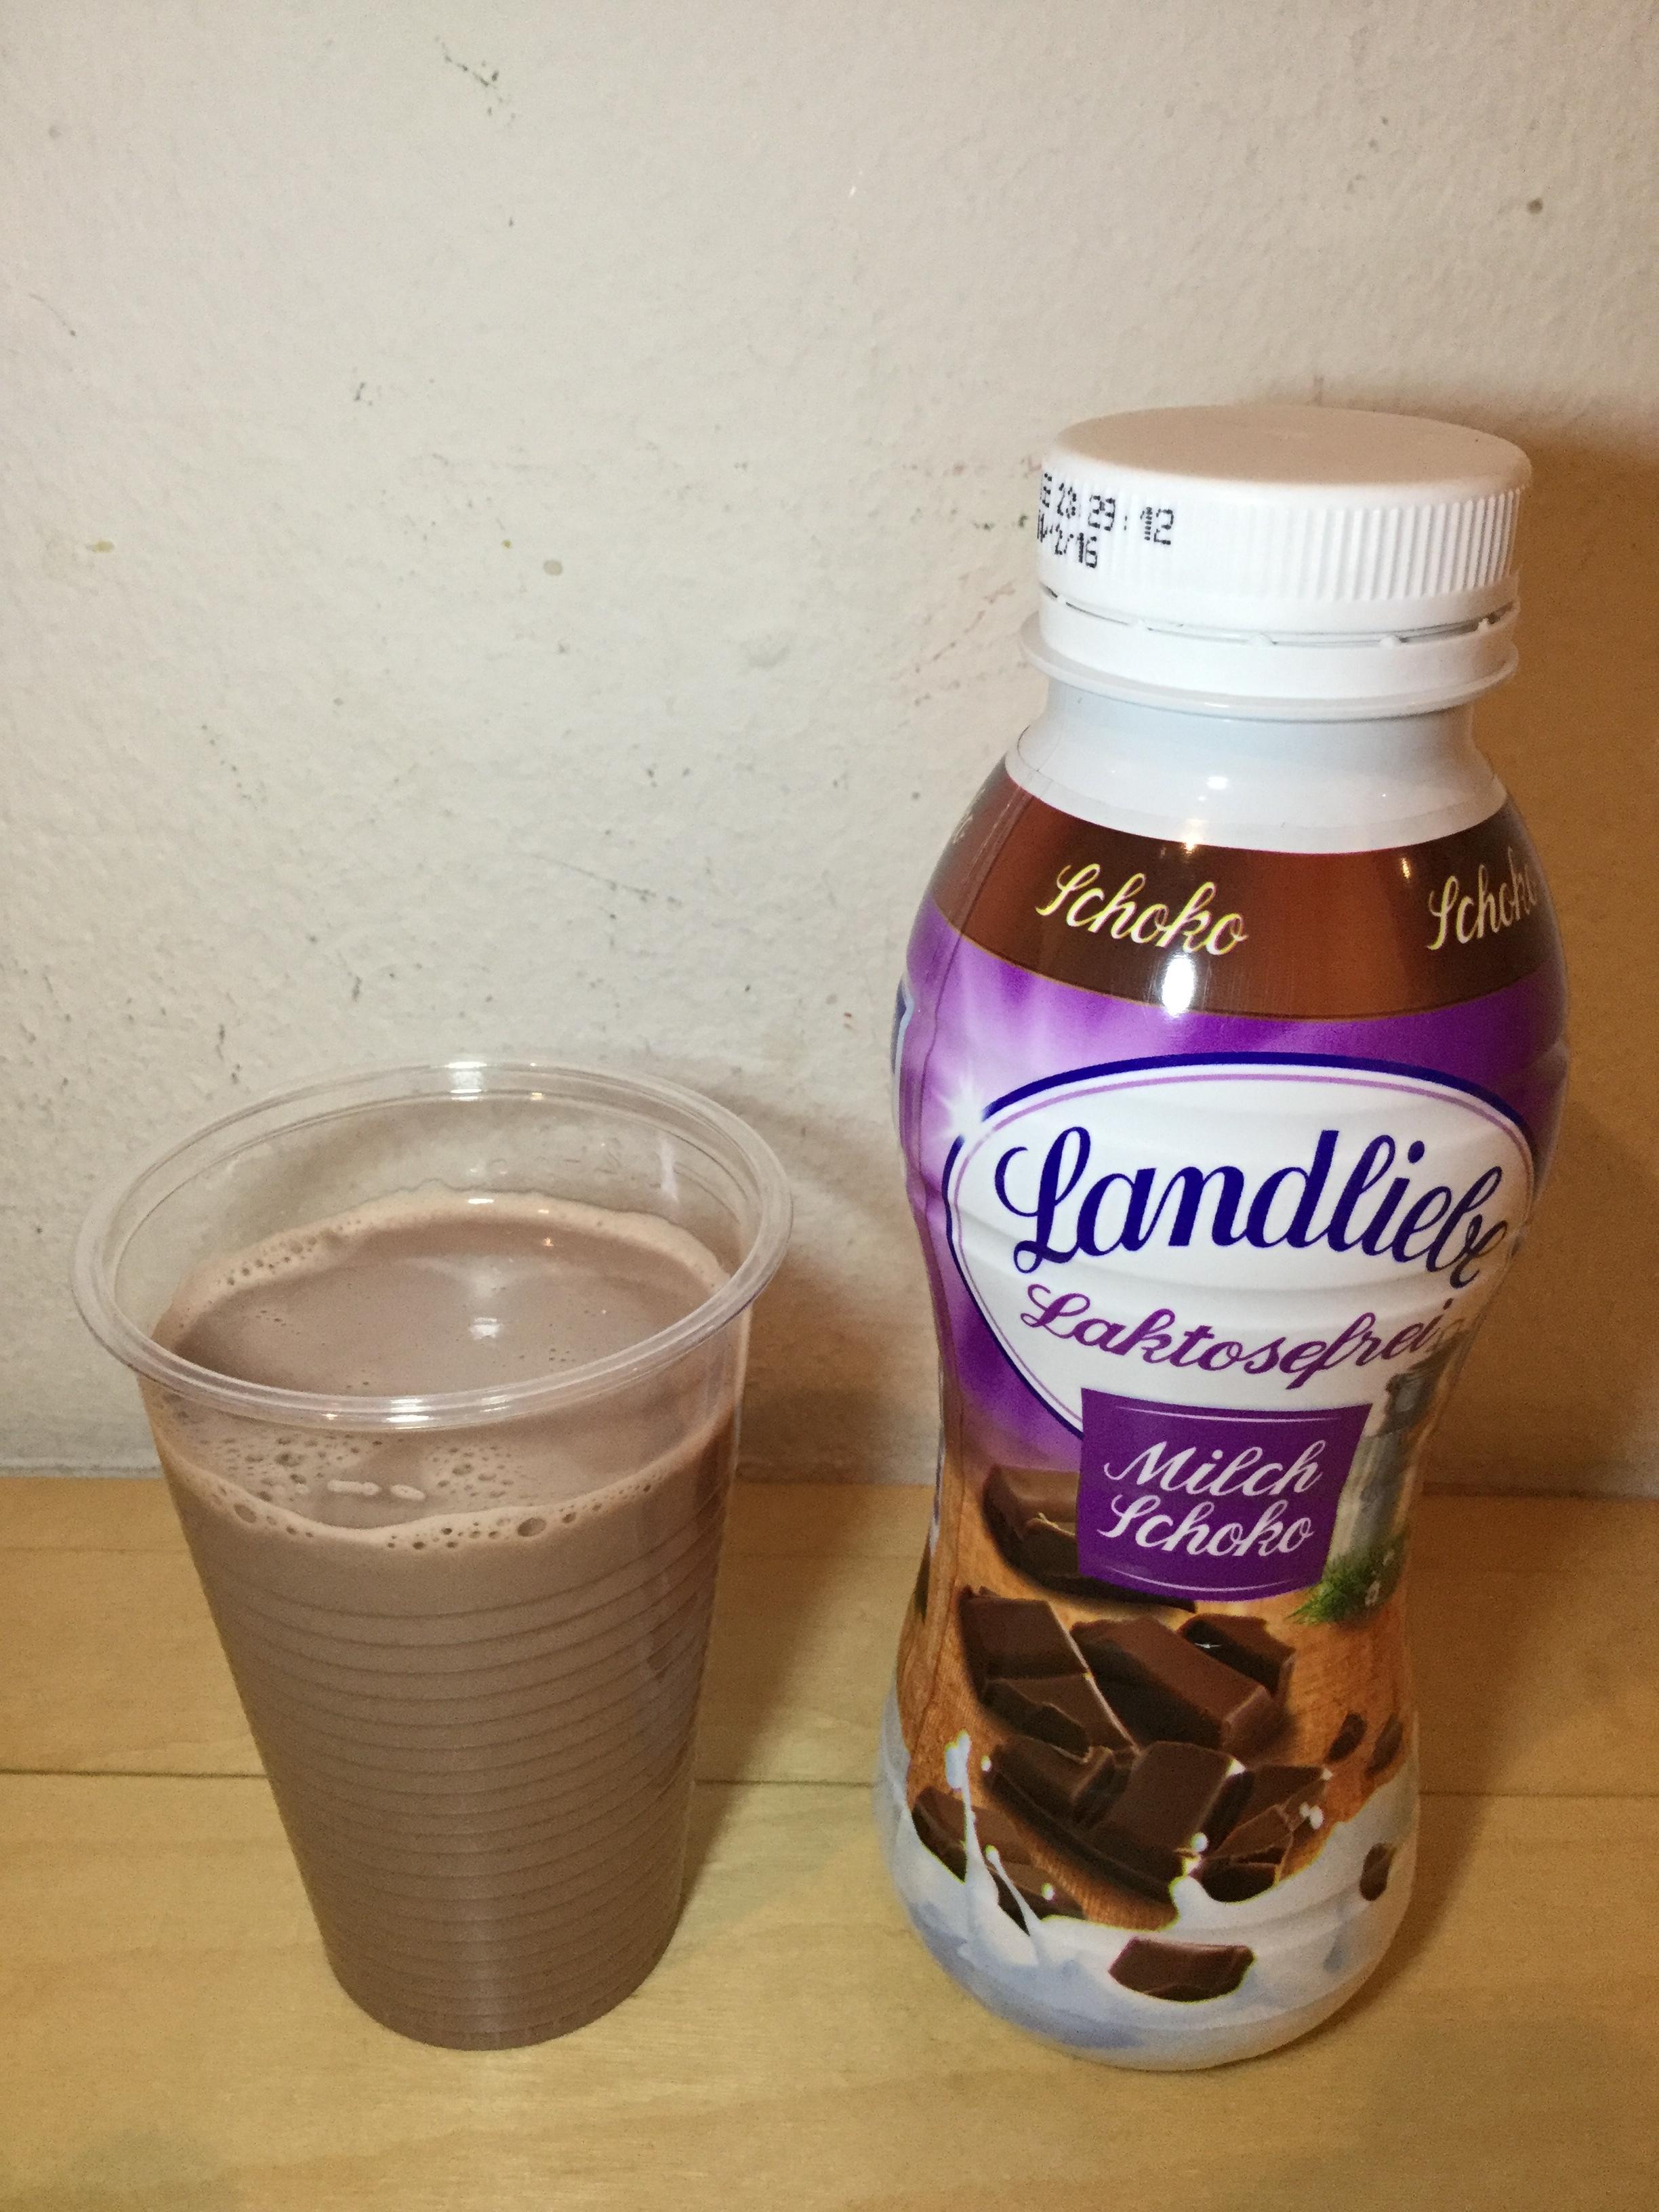 Landliebe Laktosefrei Milch Schoko Cup